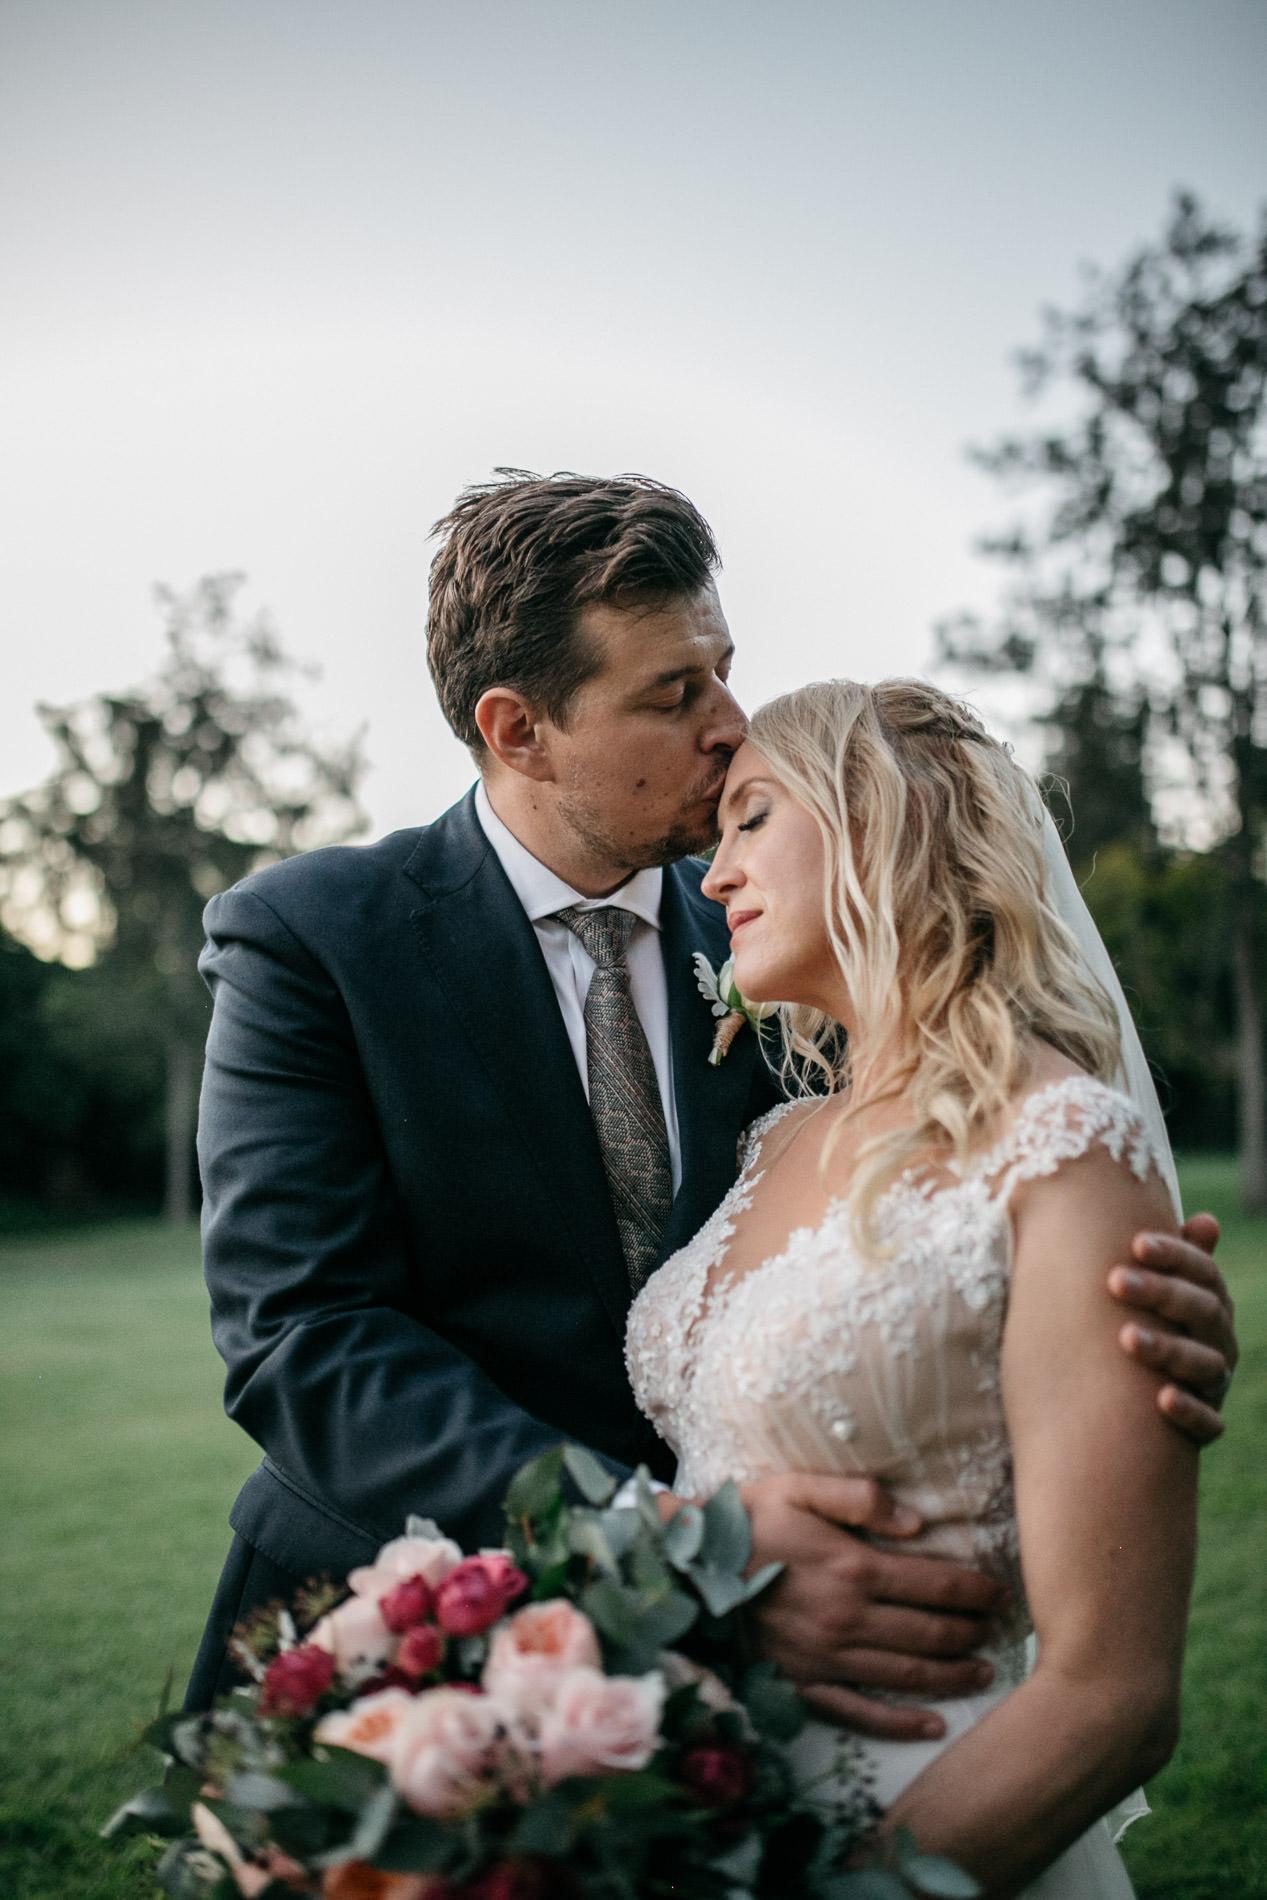 True North Photography_Boomerang Farm_Stacey and Isaac_Gold Coast Wedding_Barm Wedding_Hinterland Wedding-176.jpg